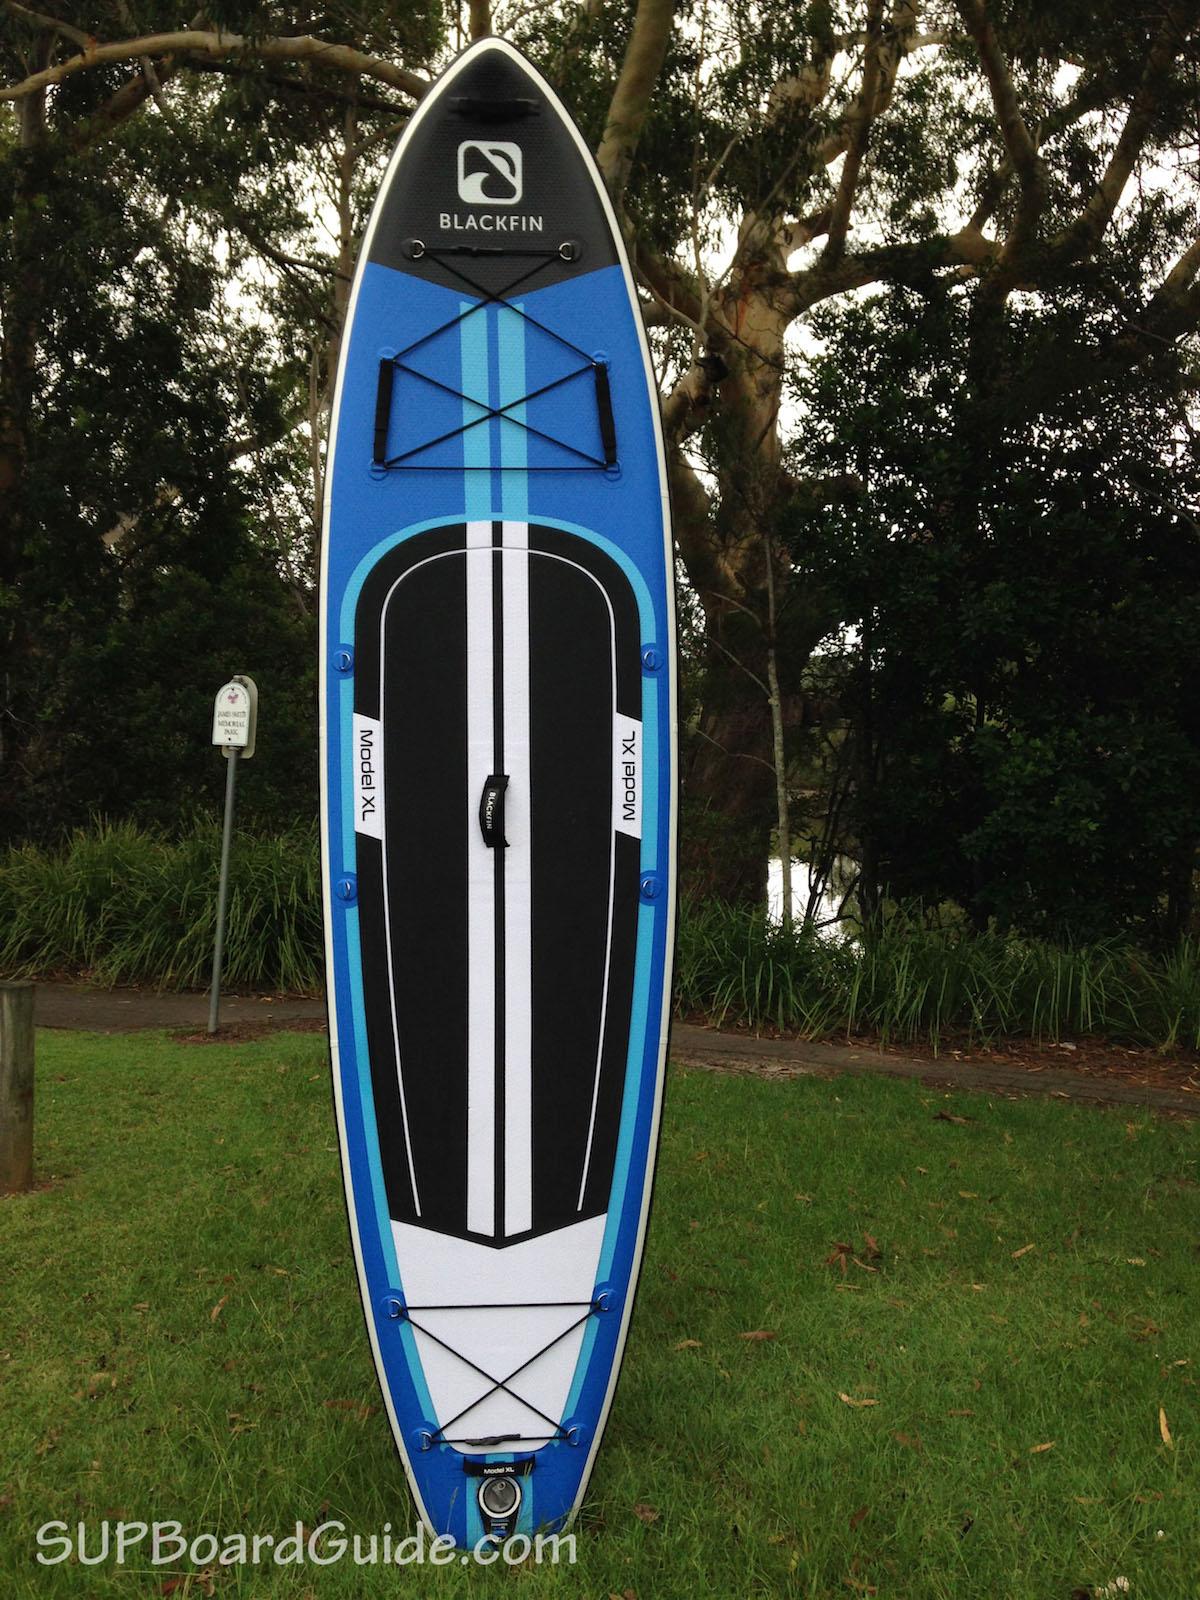 Blackfin Model XL Review